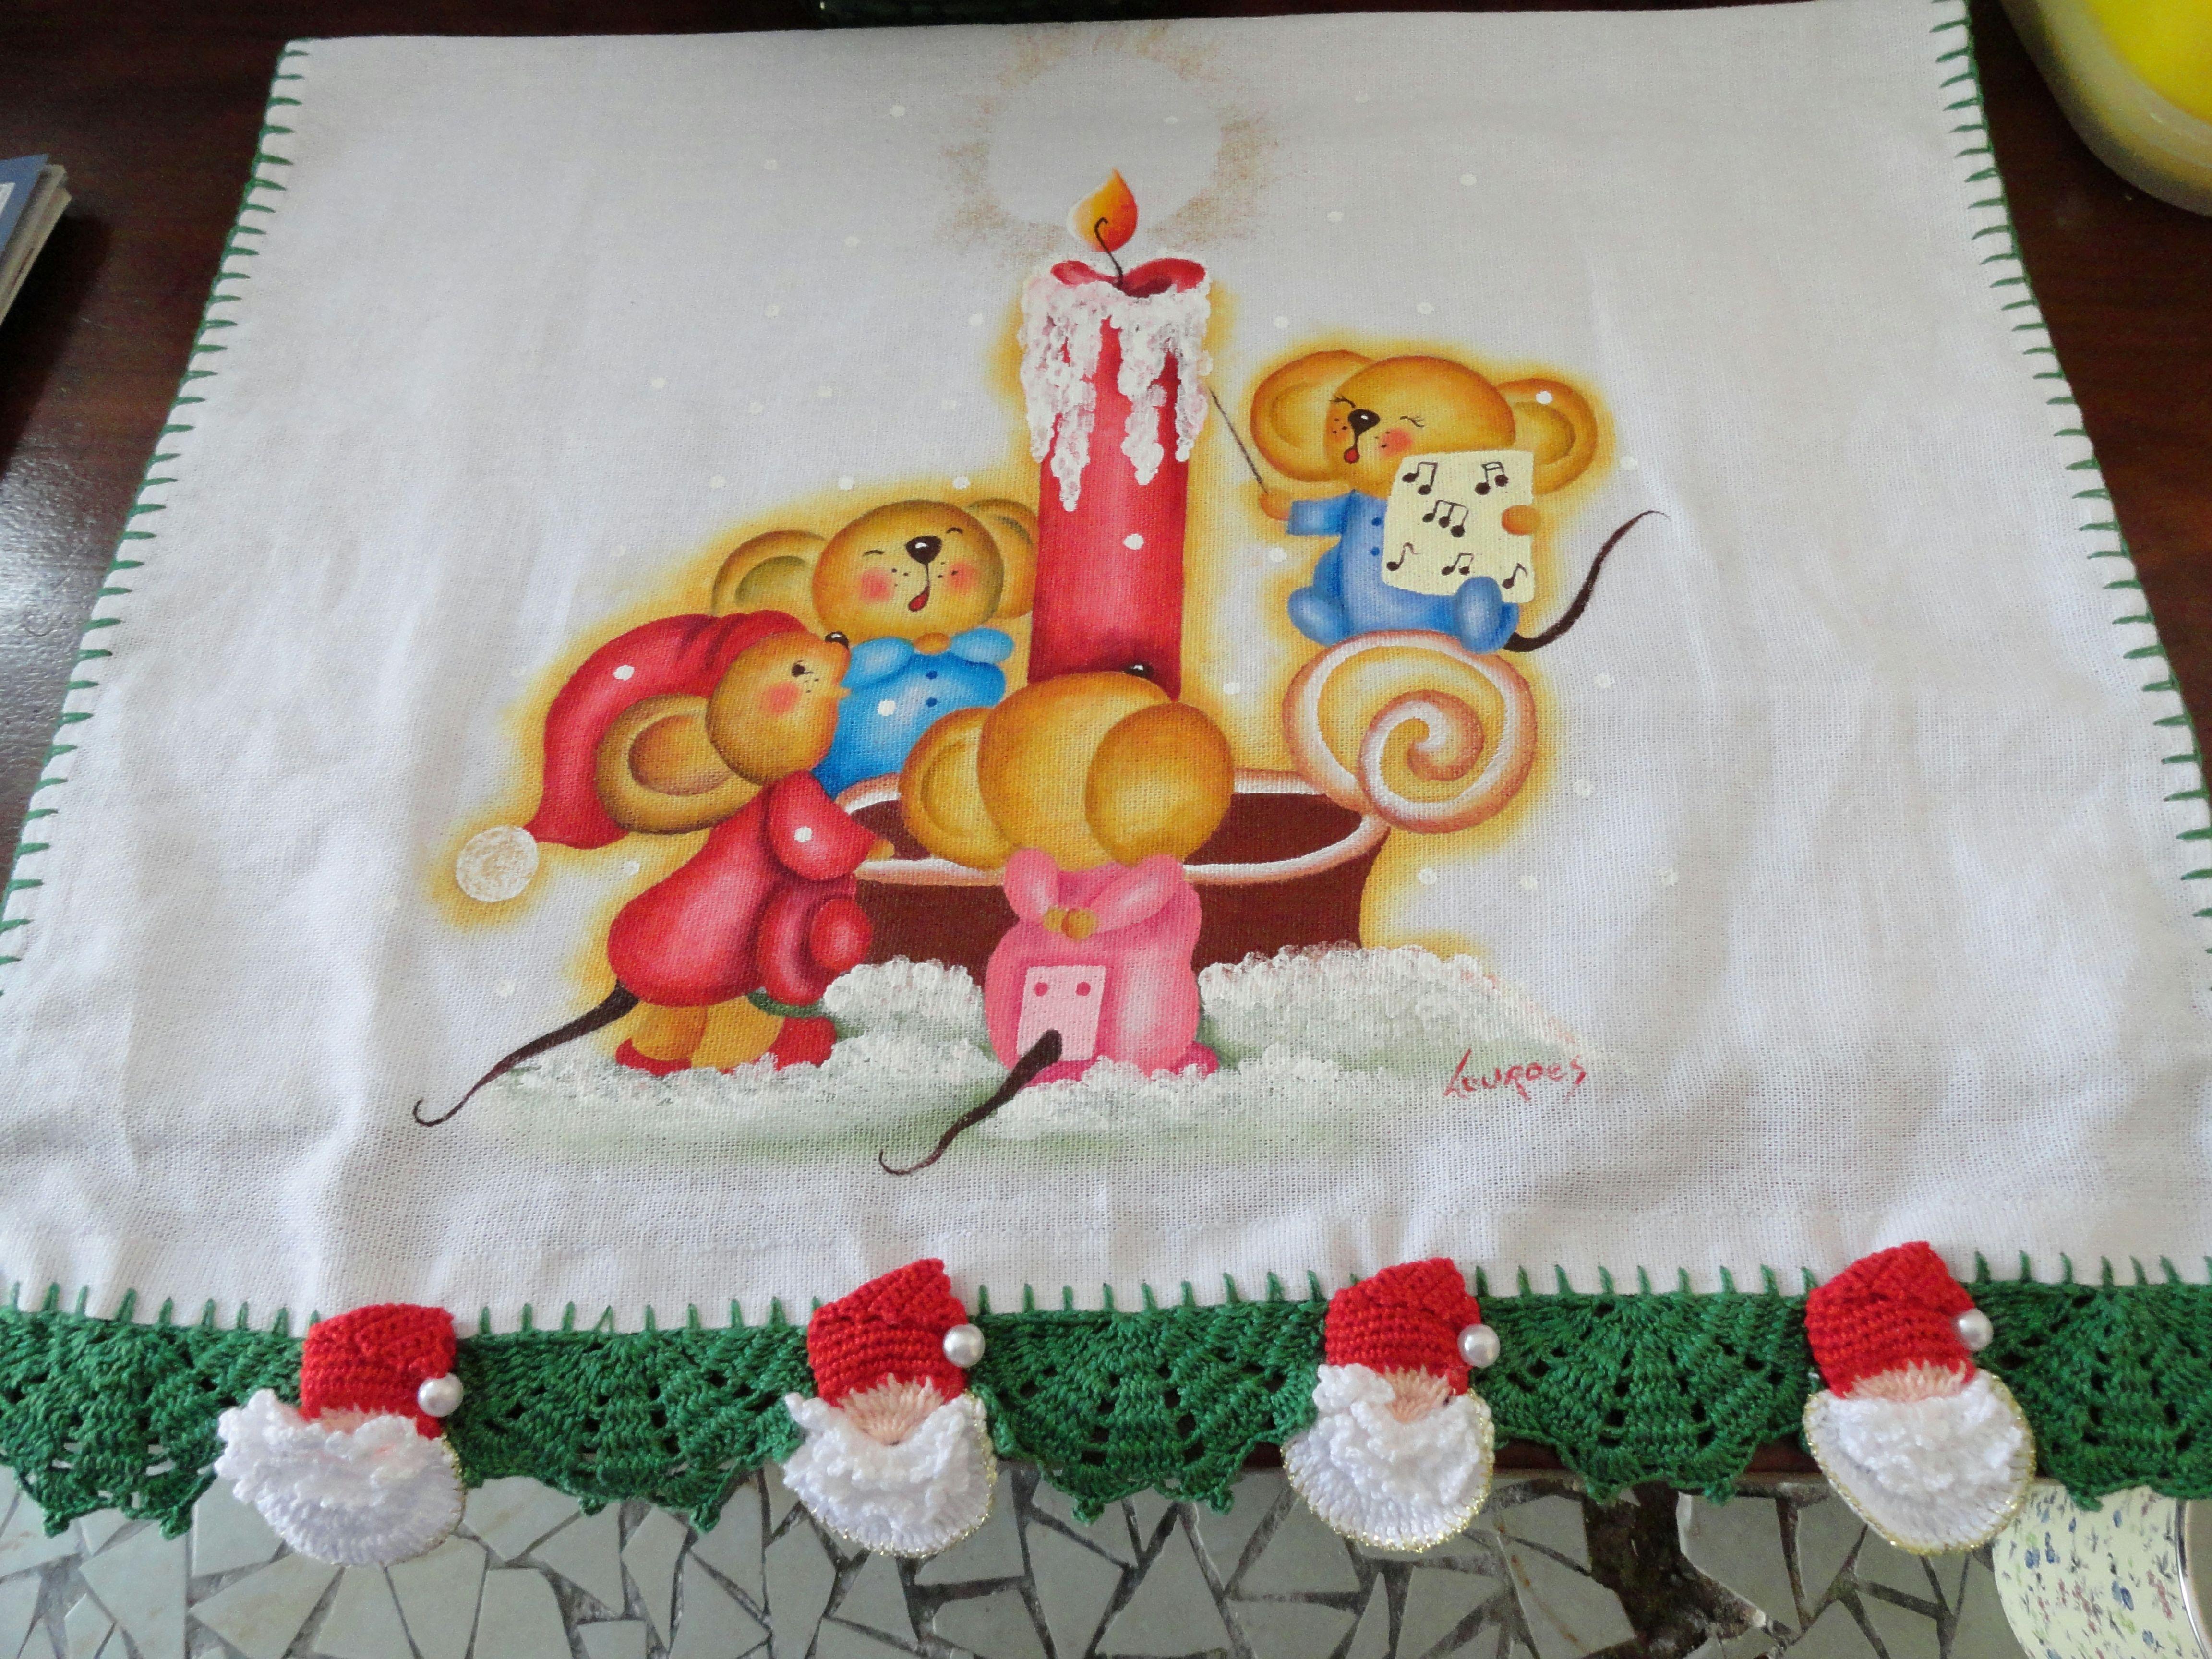 paño con un dibujo navideño